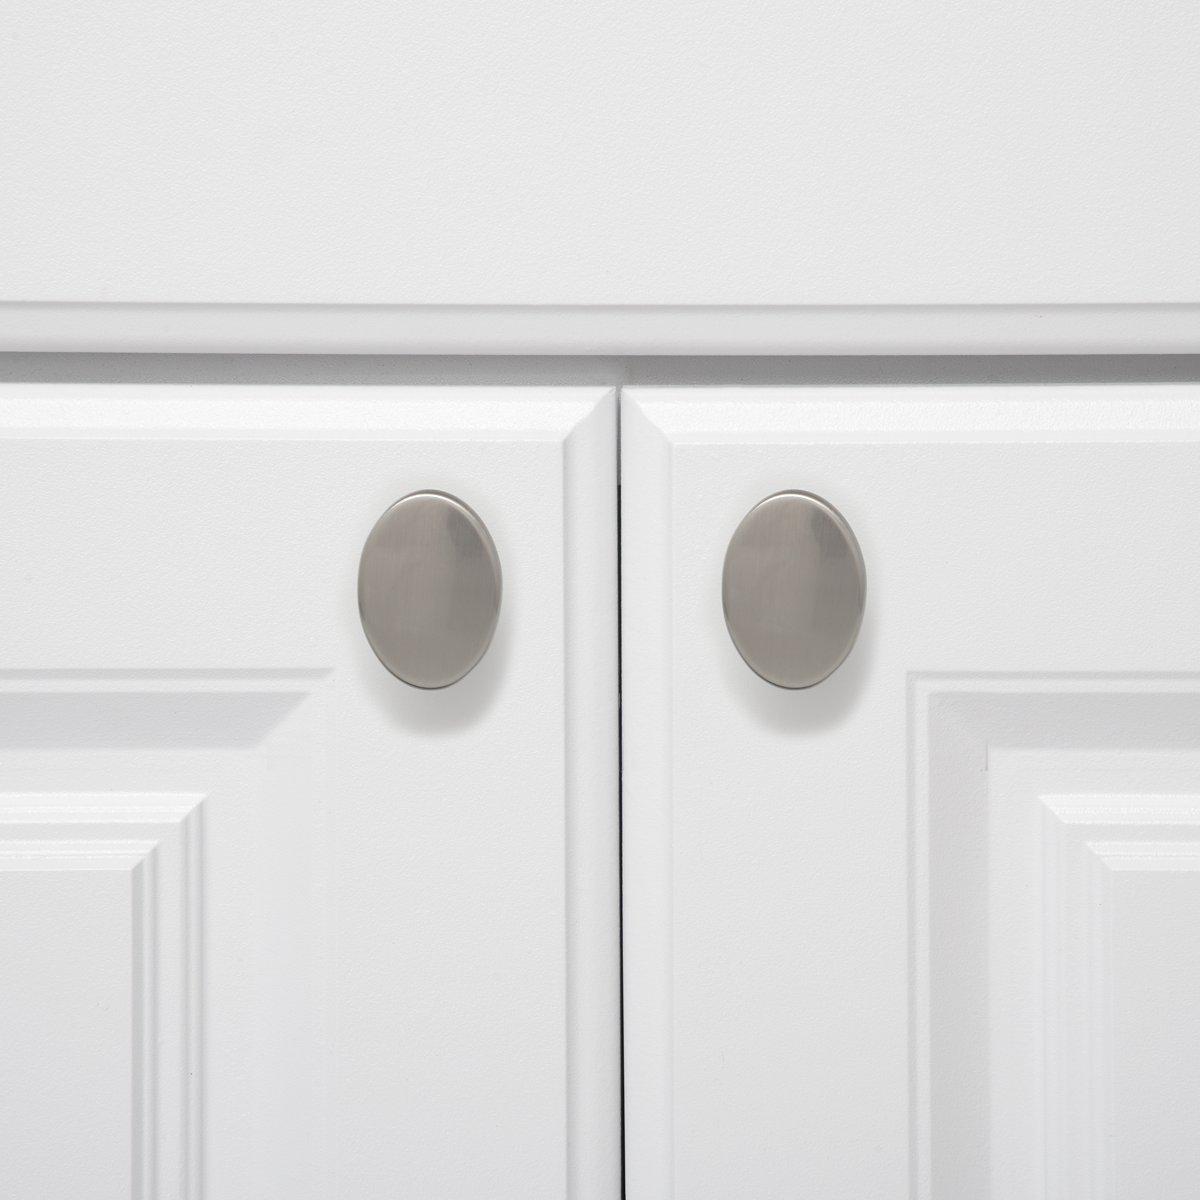 Oval Drawer Knob Basics Flat Polished Chrome Pack of 25